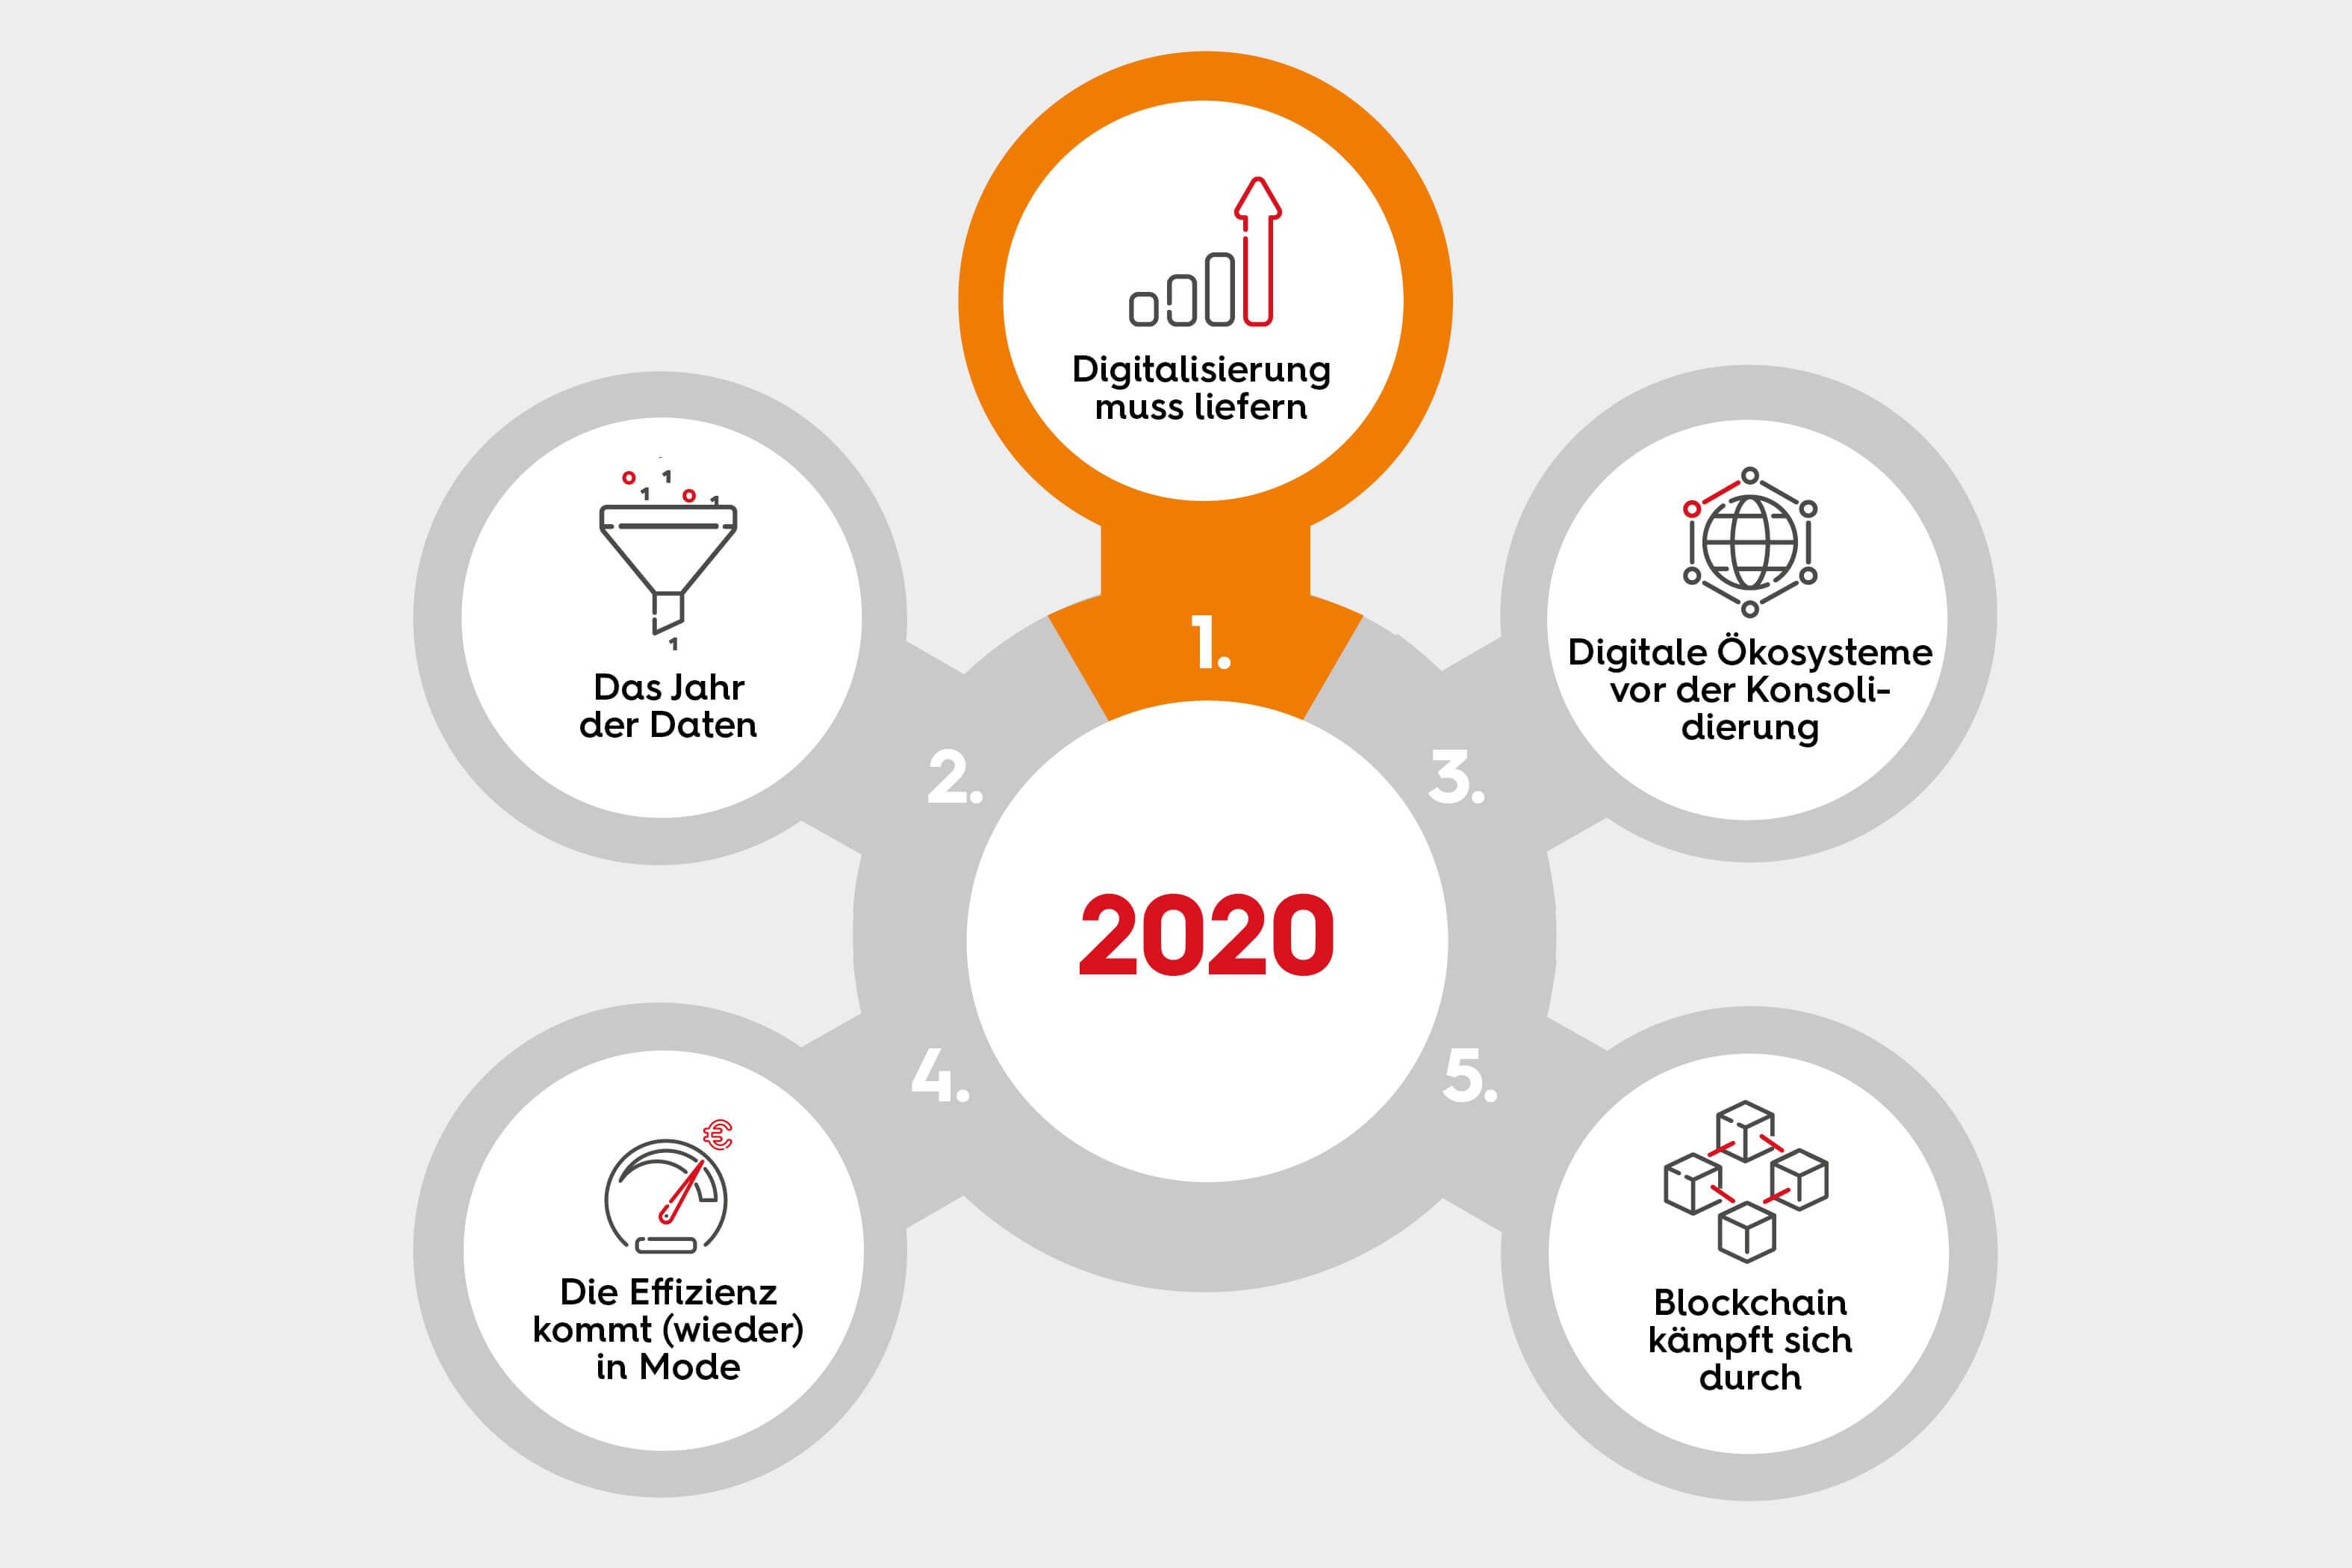 Next Perspectives 2020 Digitalisierung muss liefern